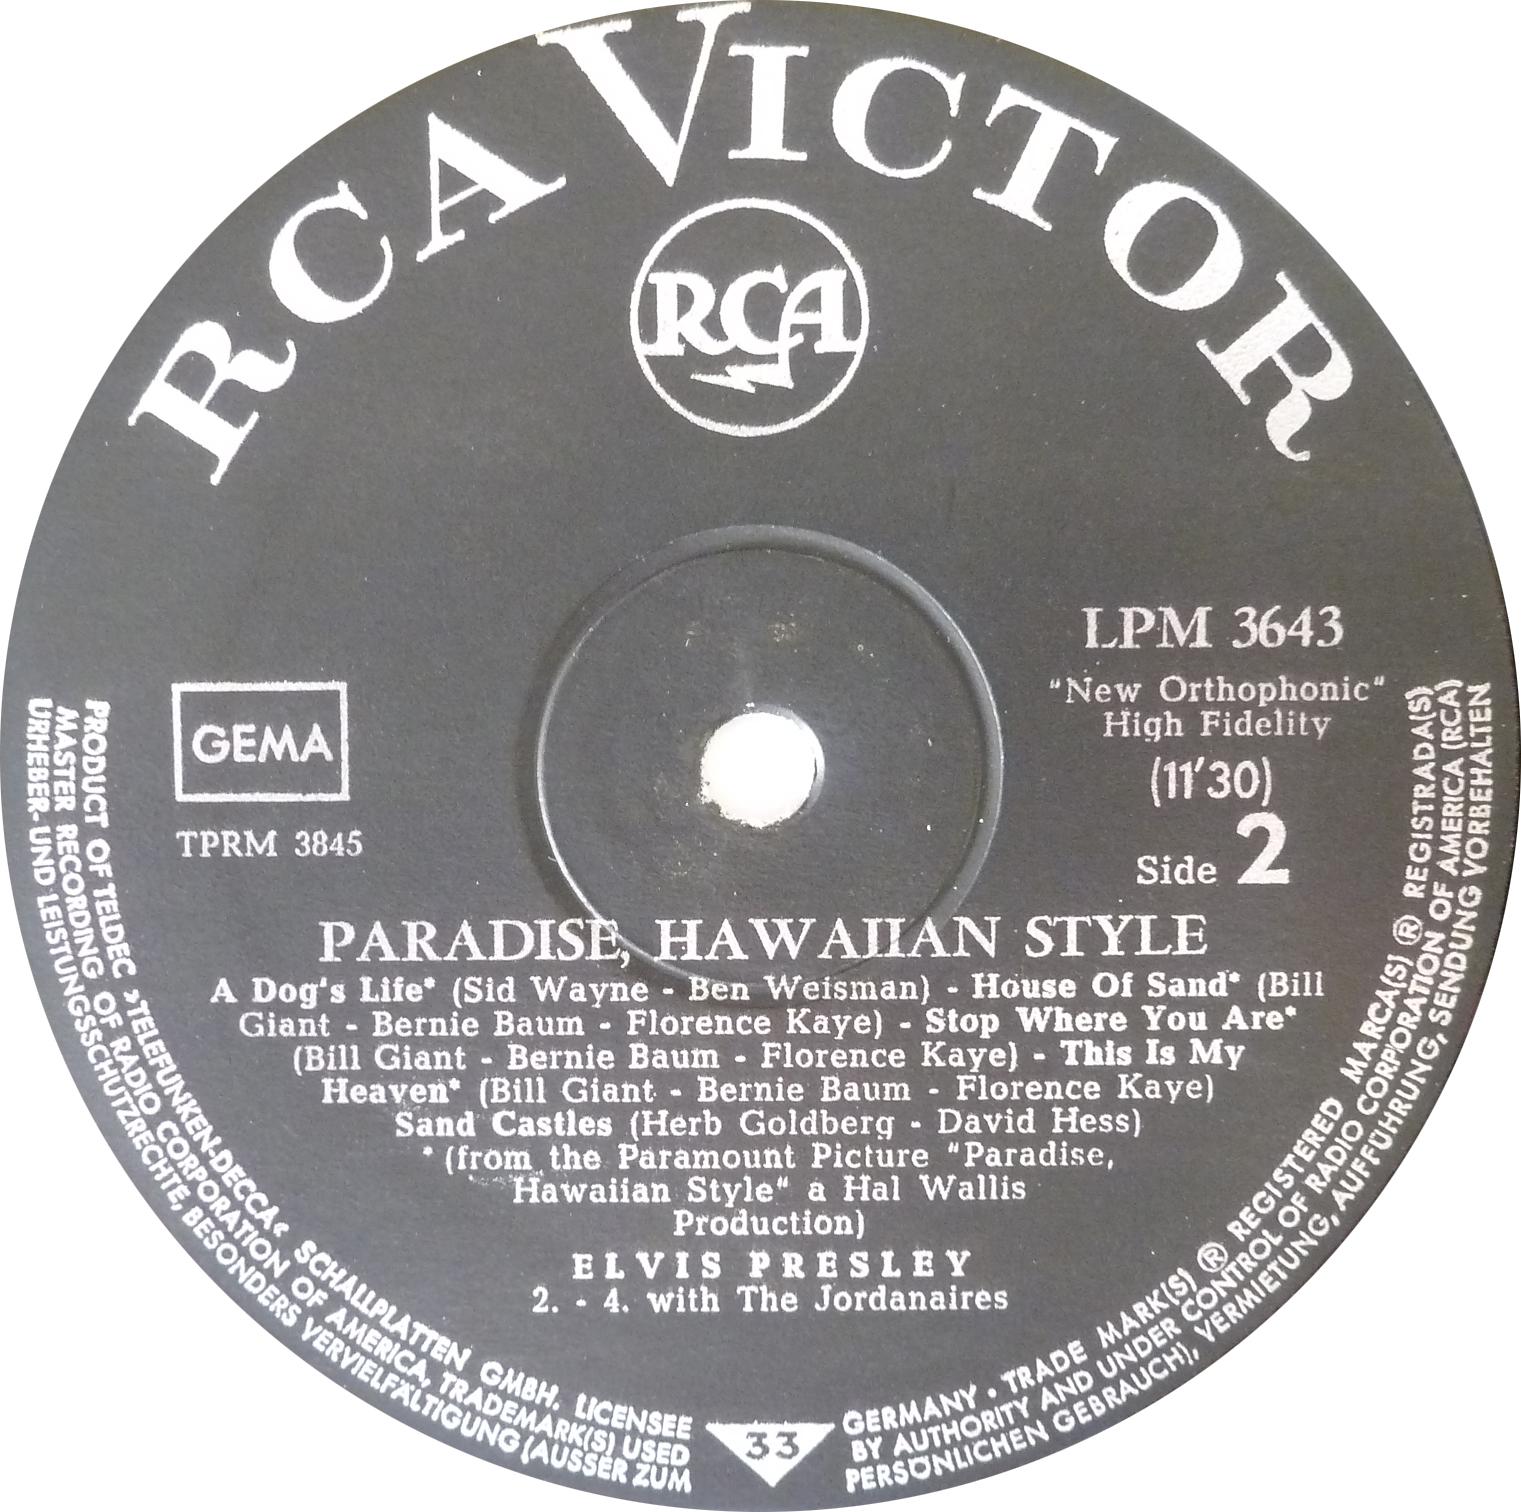 PARADISE, HAWAIIAN STYLE Phs66lpmseite2lcqwc